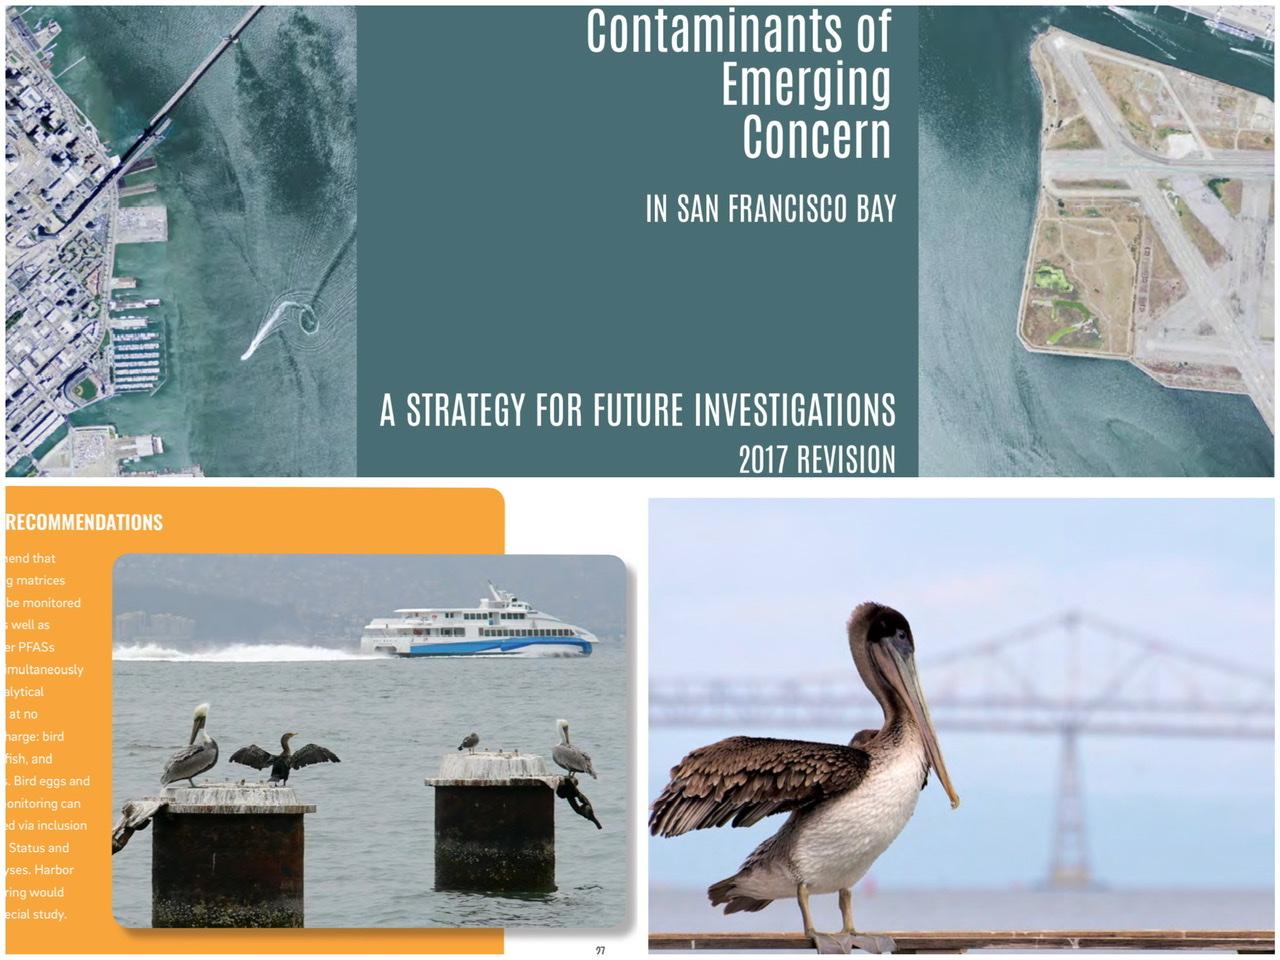 Contaminants of Emerging Concern